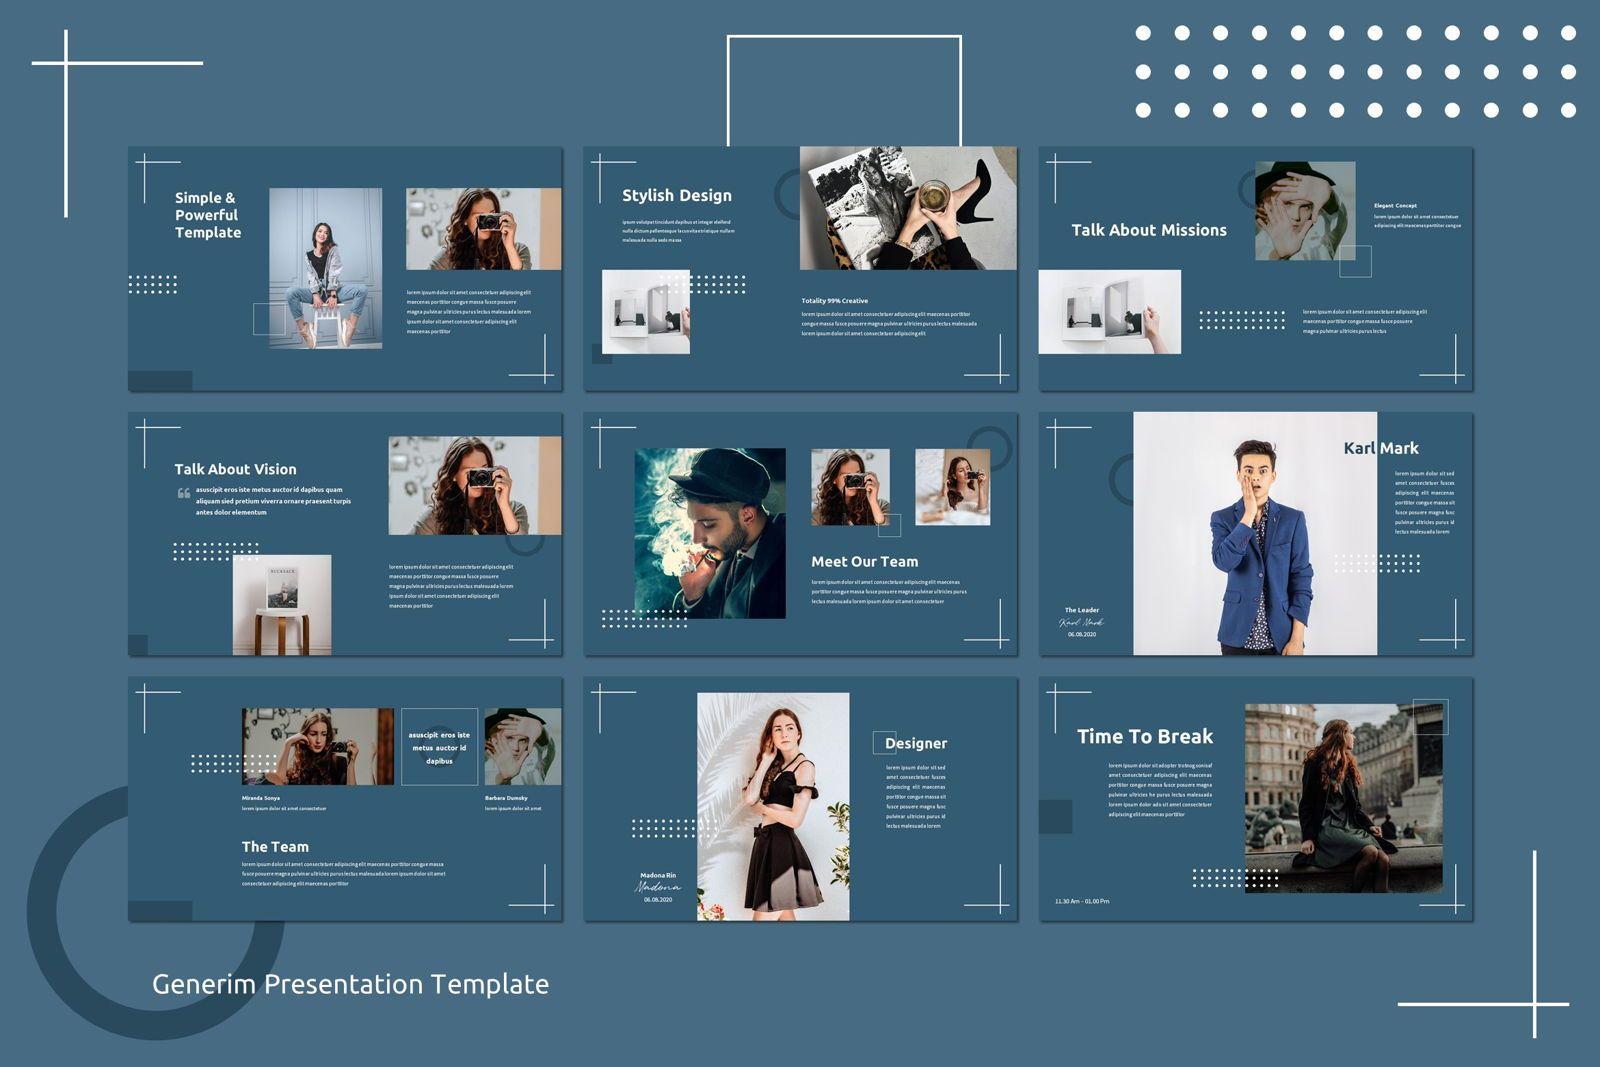 Generim - Google Slides Template, Slide 3, 07791, Presentation Templates — PoweredTemplate.com